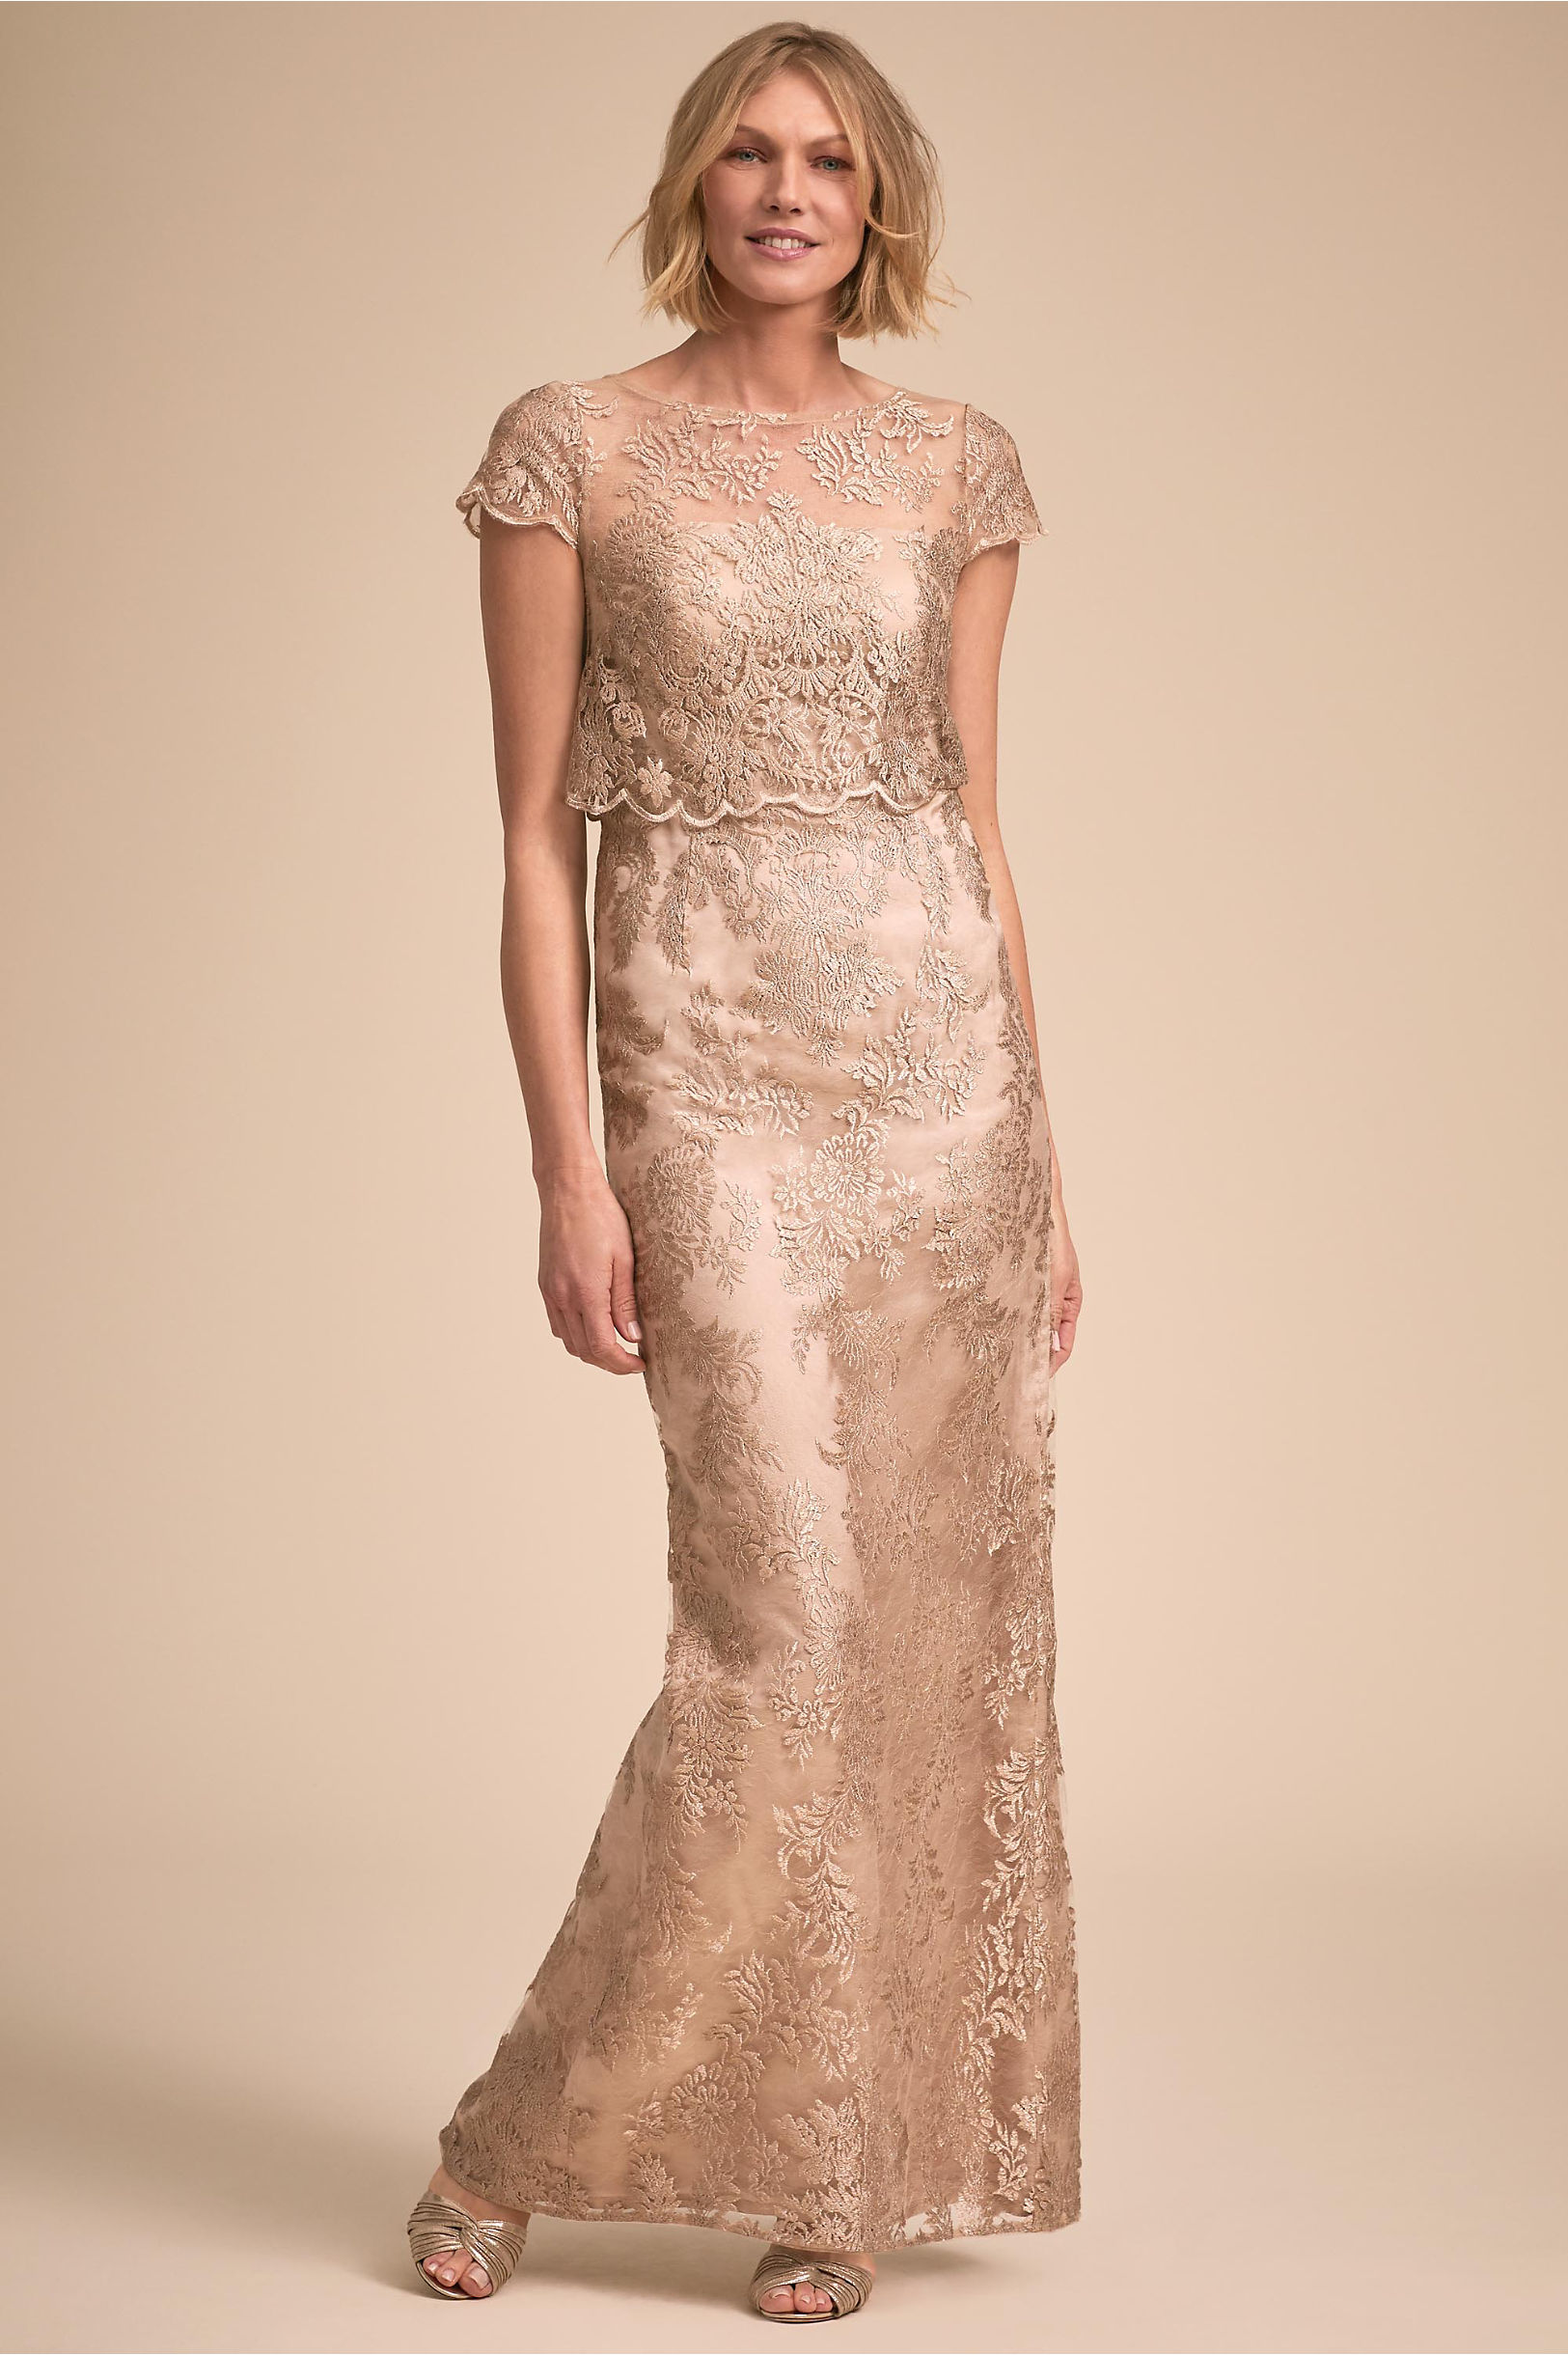 mother of the bride dresses long length, short, tea-length